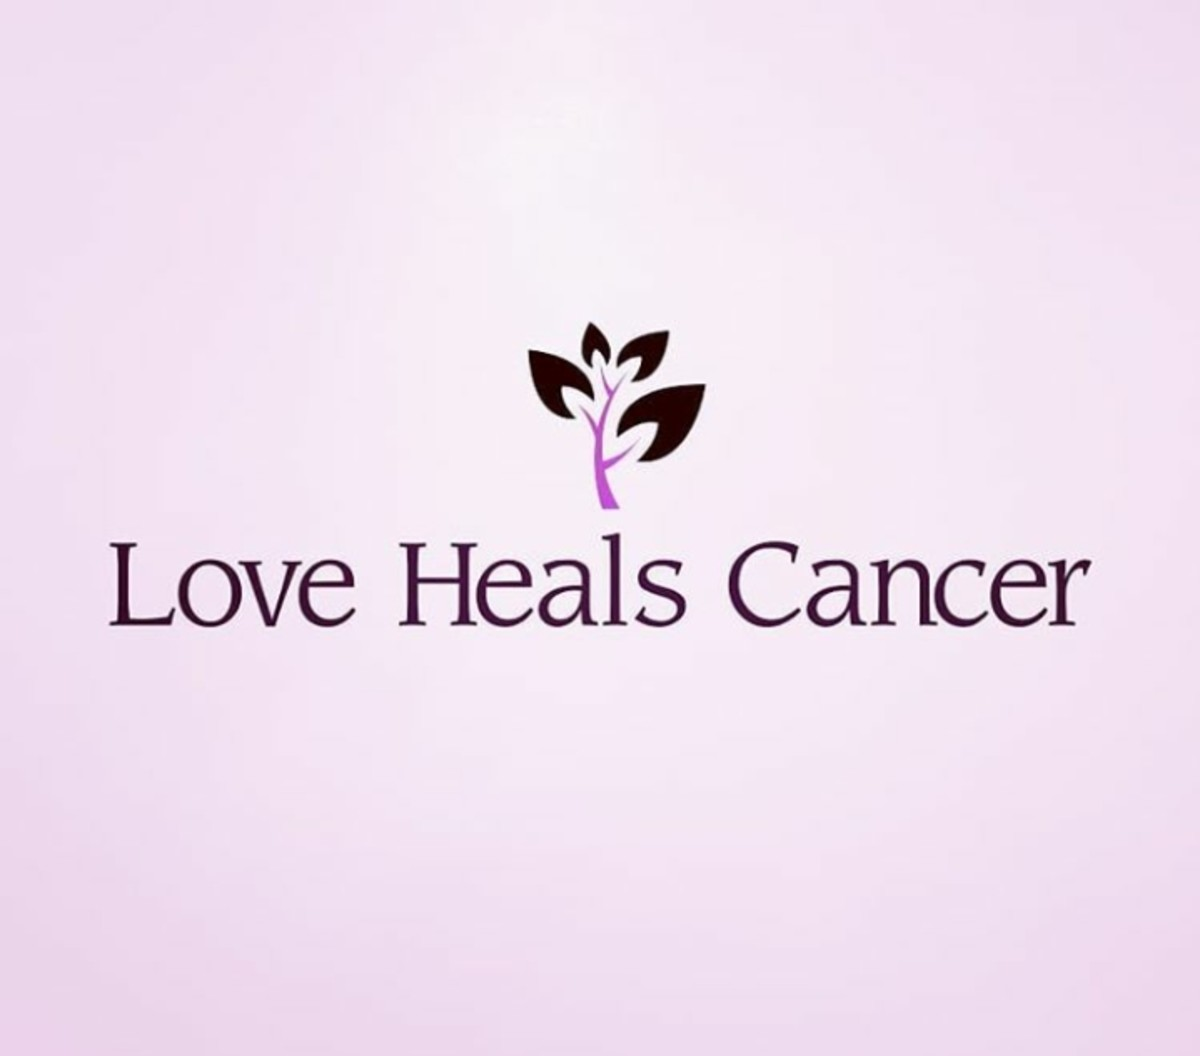 celebrating-life-1-love-heals-cancer